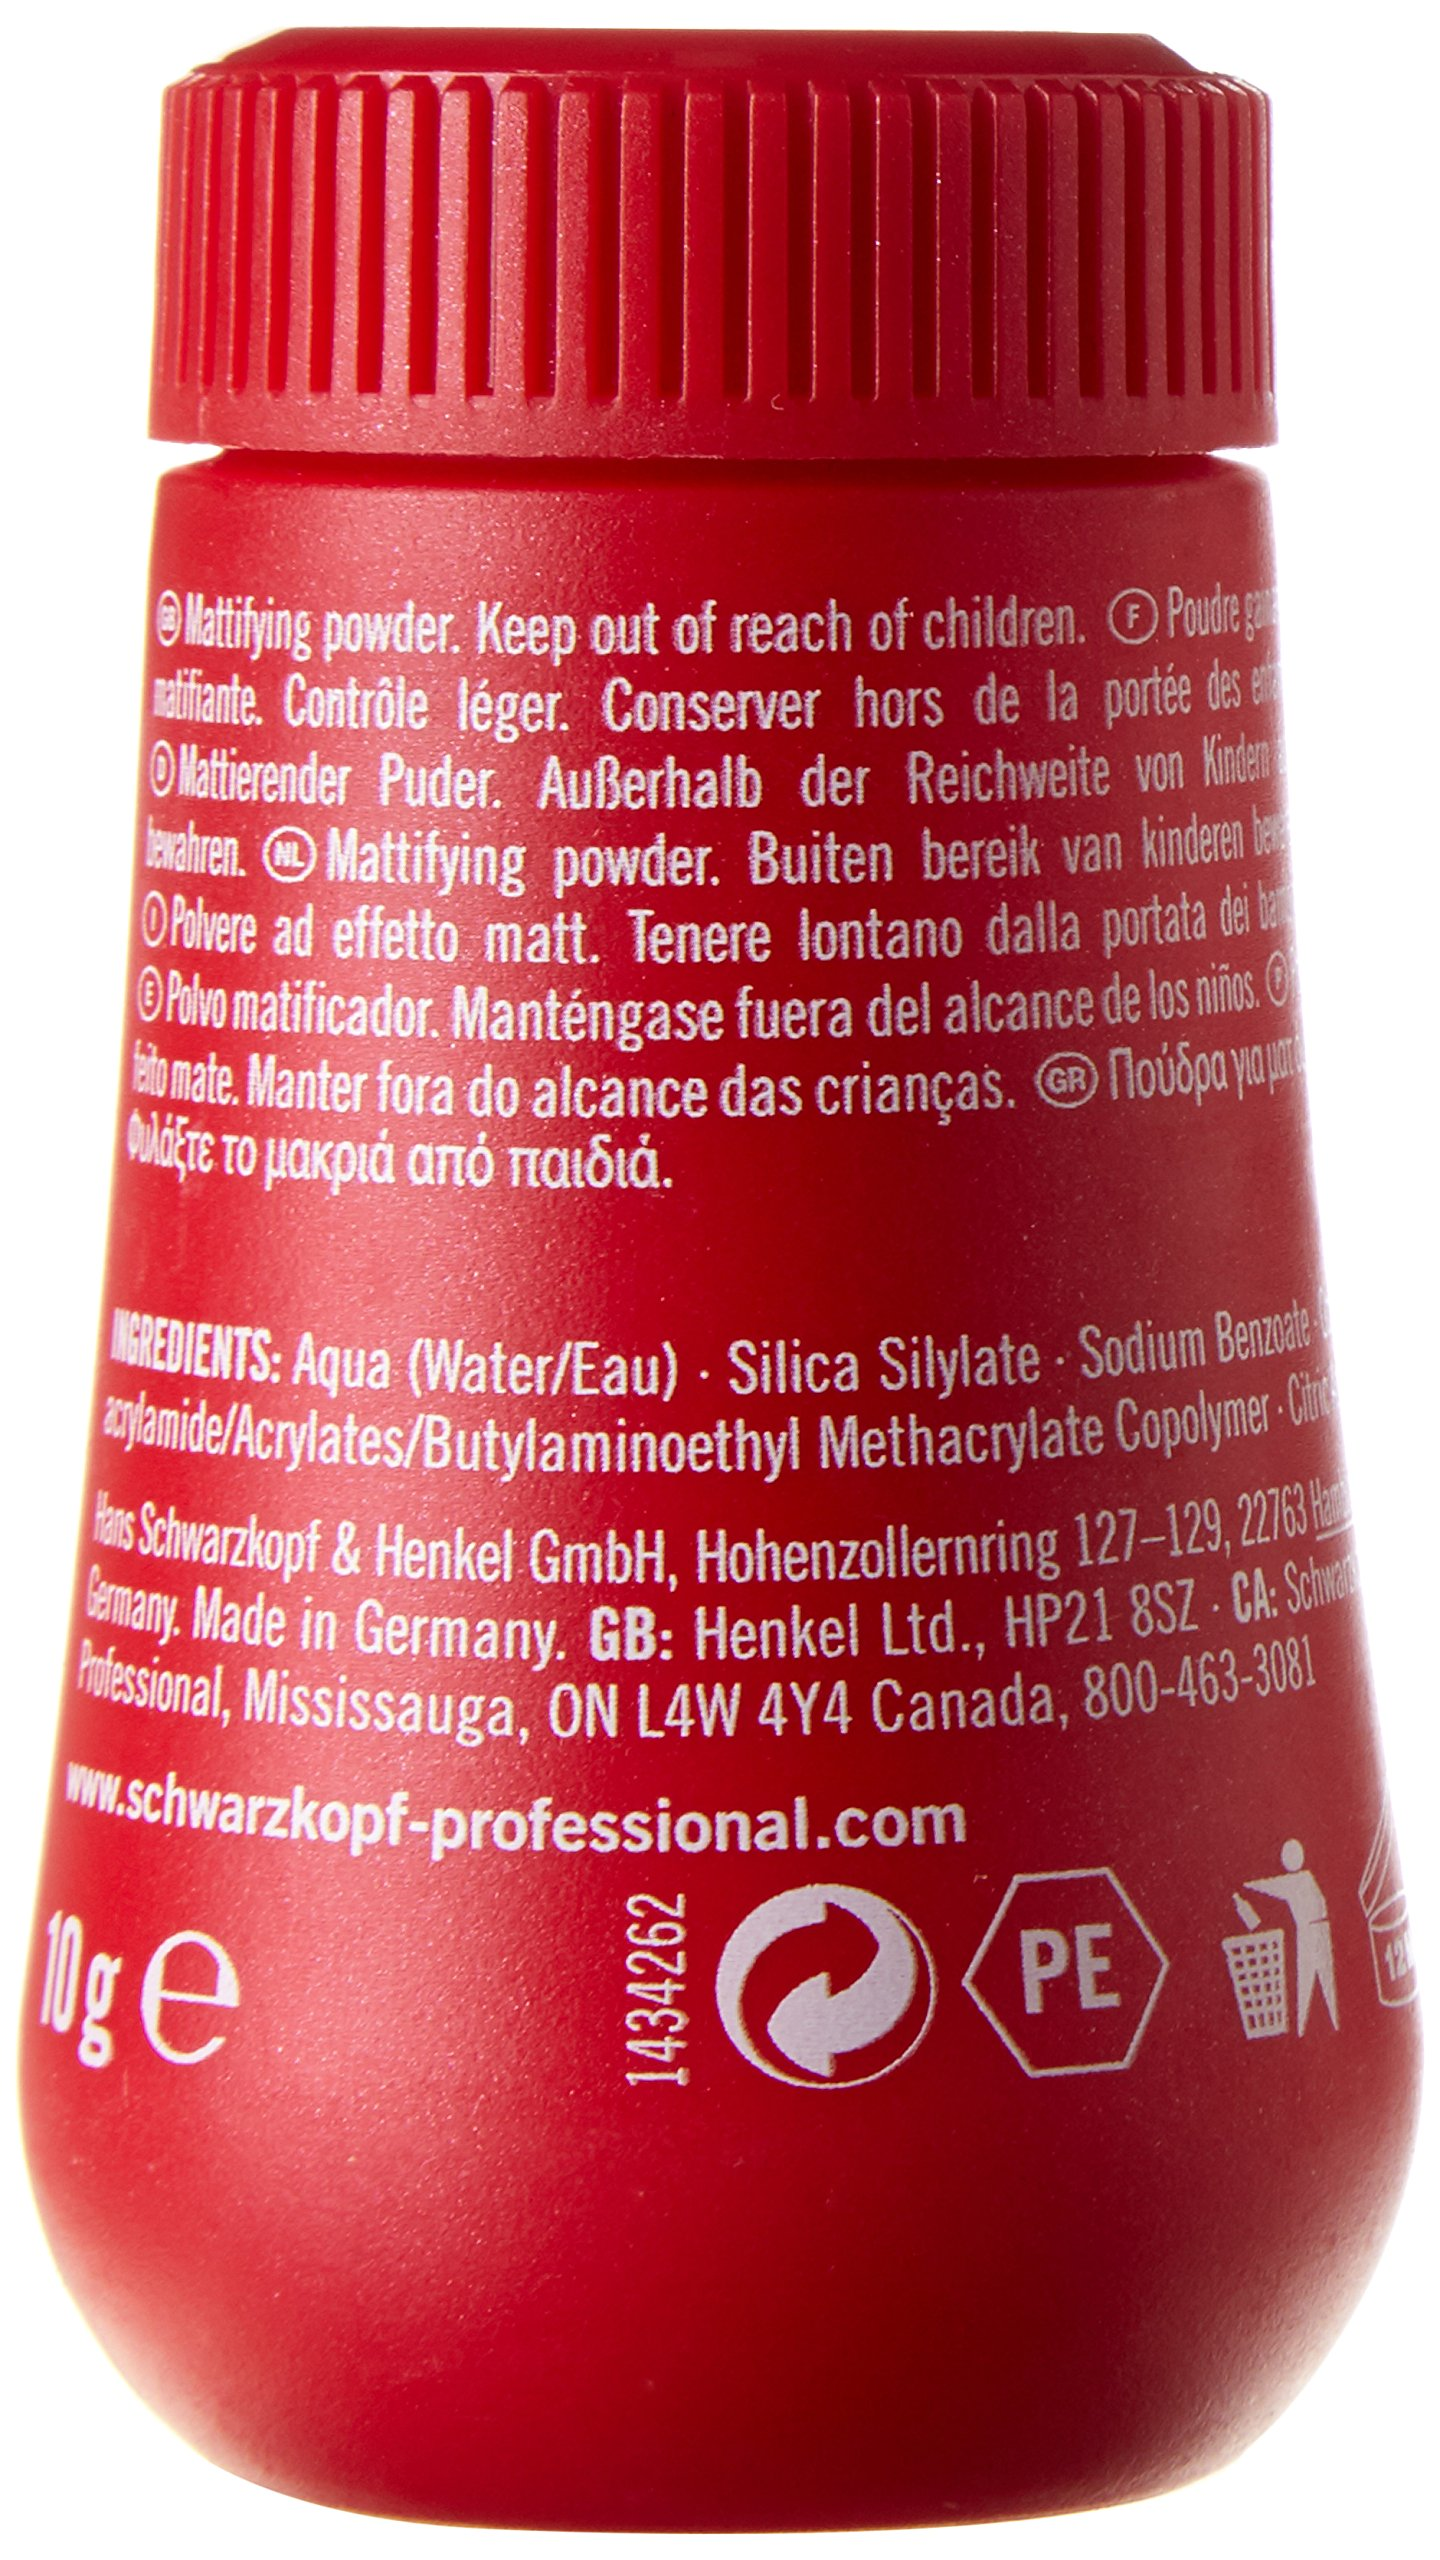 Osis+ Polvo Matificador, Tono de Piel Medio – 10 gr